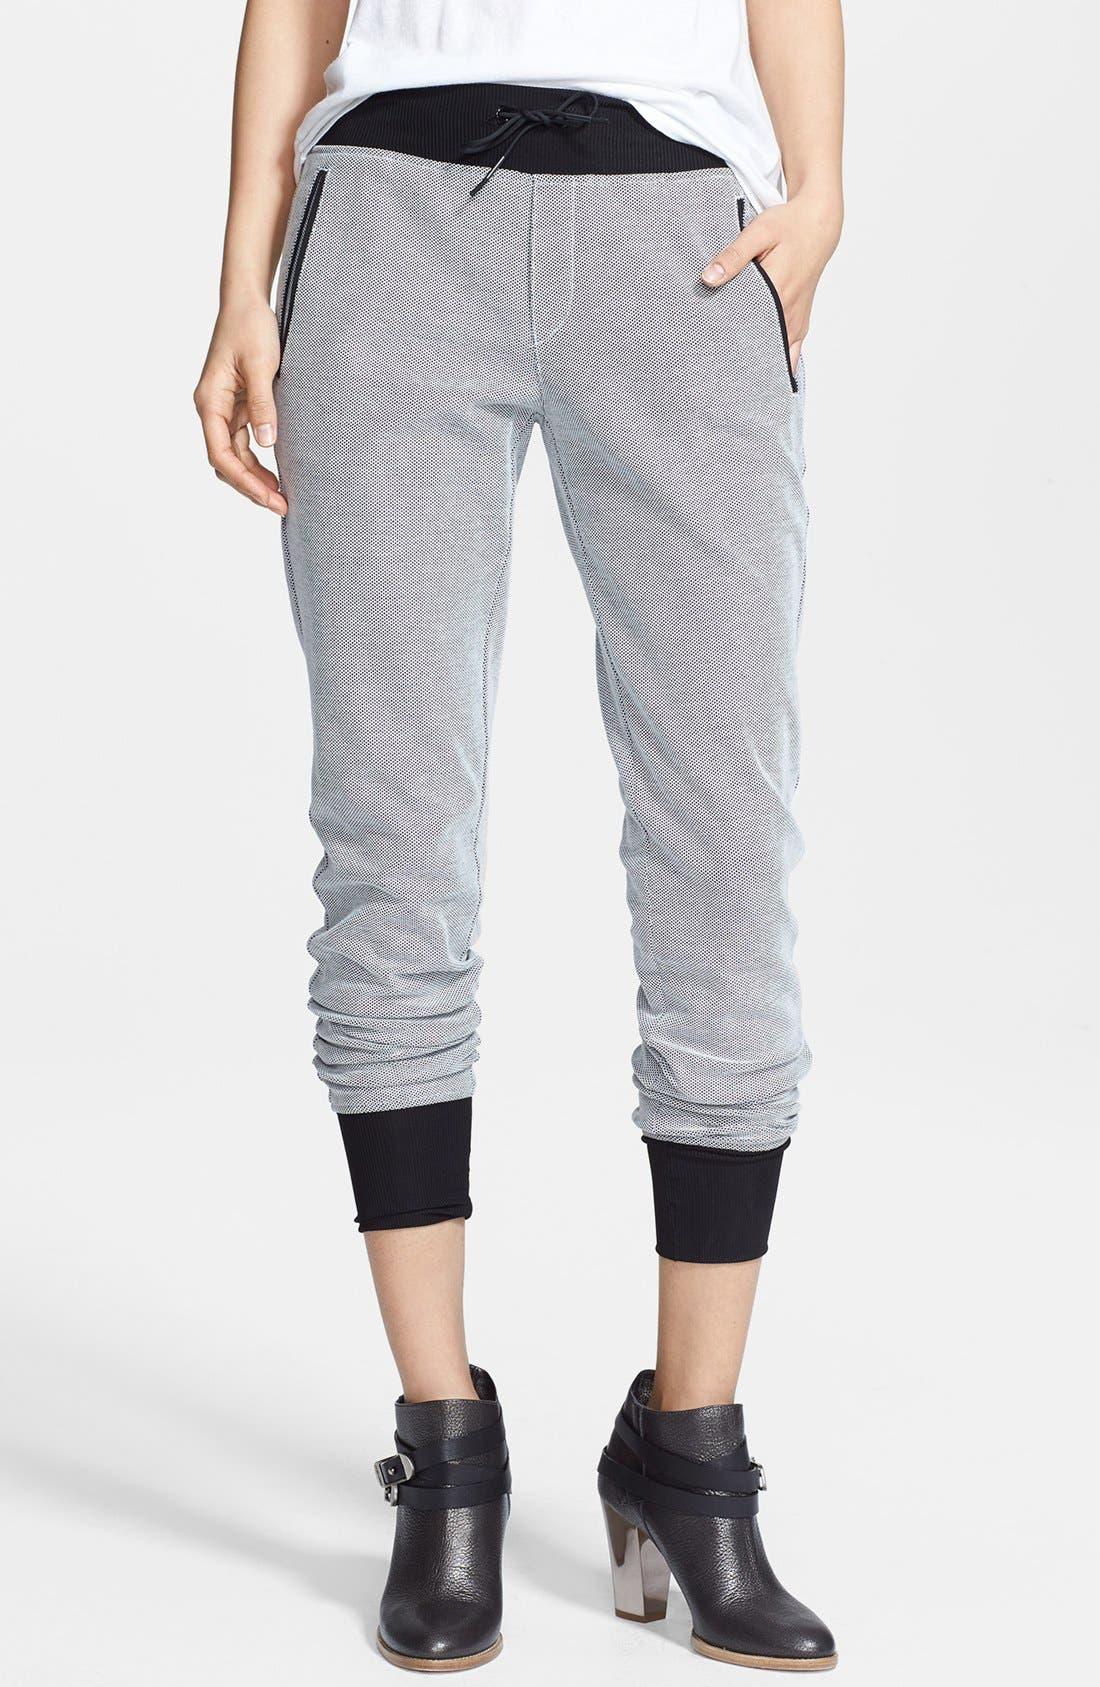 Alternate Image 1 Selected - rag & bone 'Lena' Cotton Piqué Track Pants